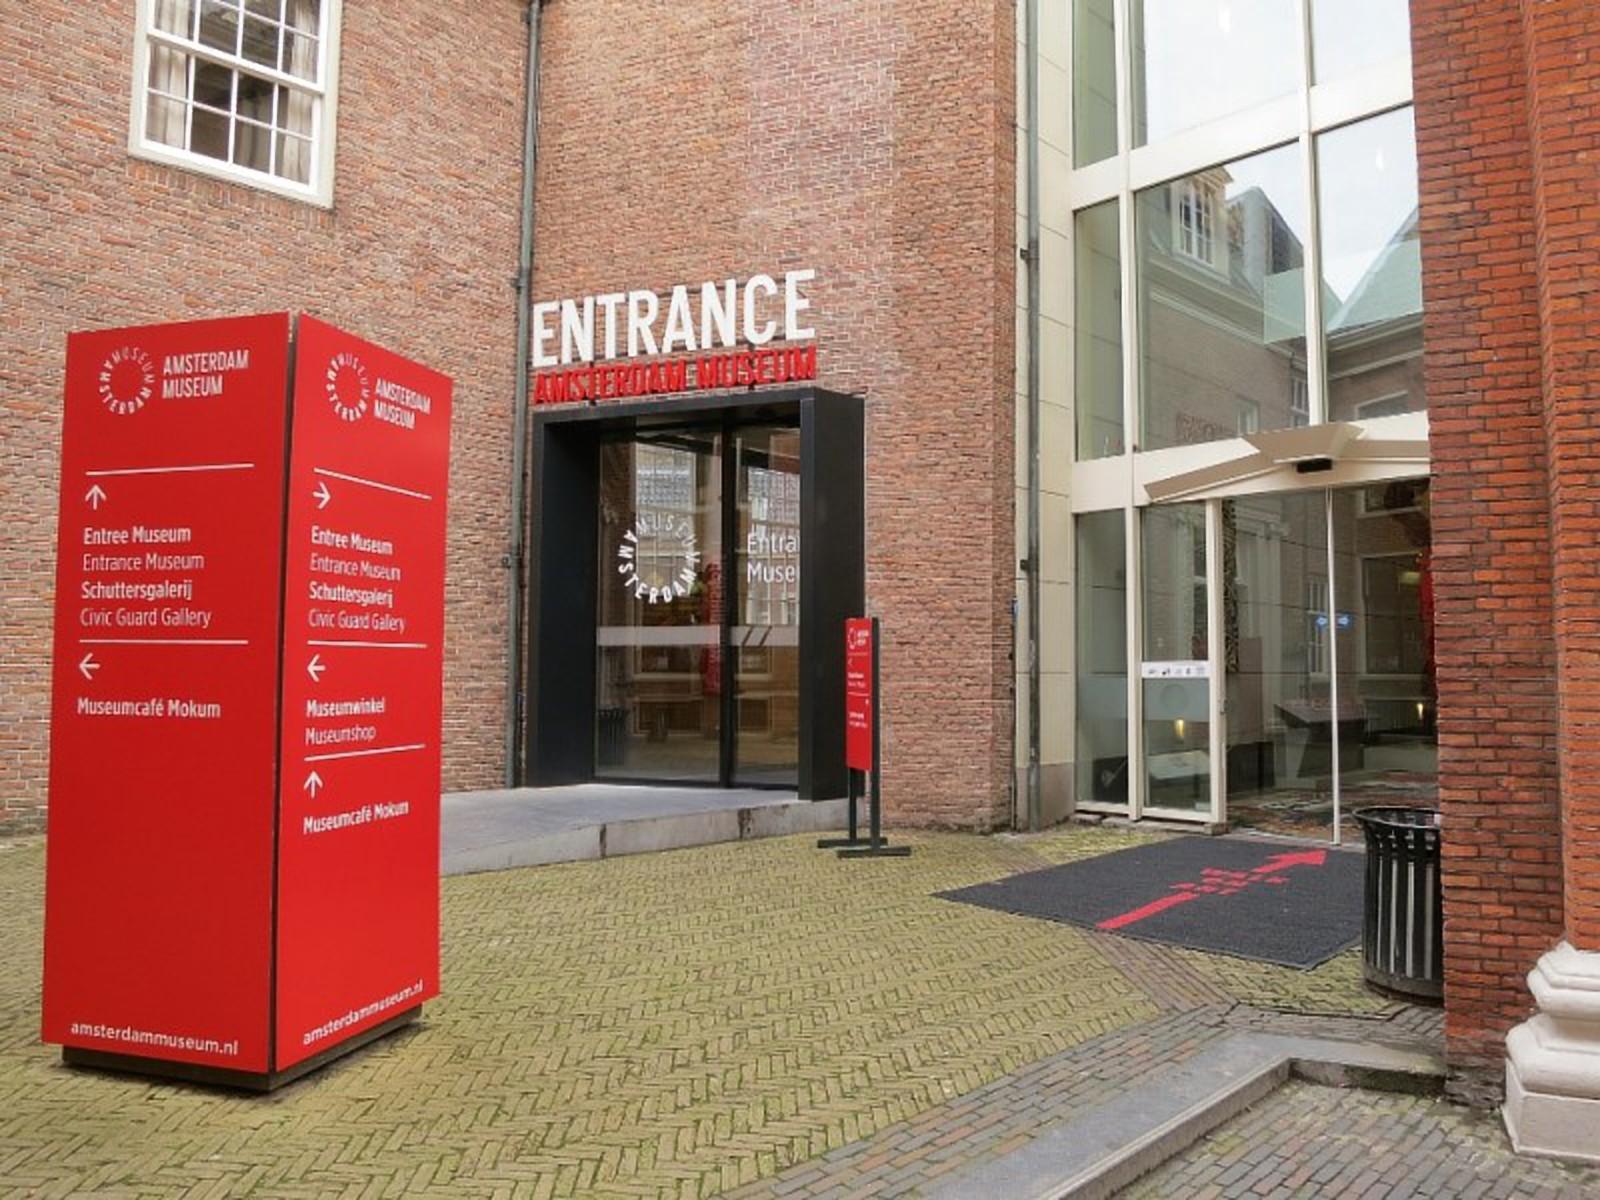 Main-Courtyard-Entrance-Amsterdam-Museum-800x600. vergroot - web 5